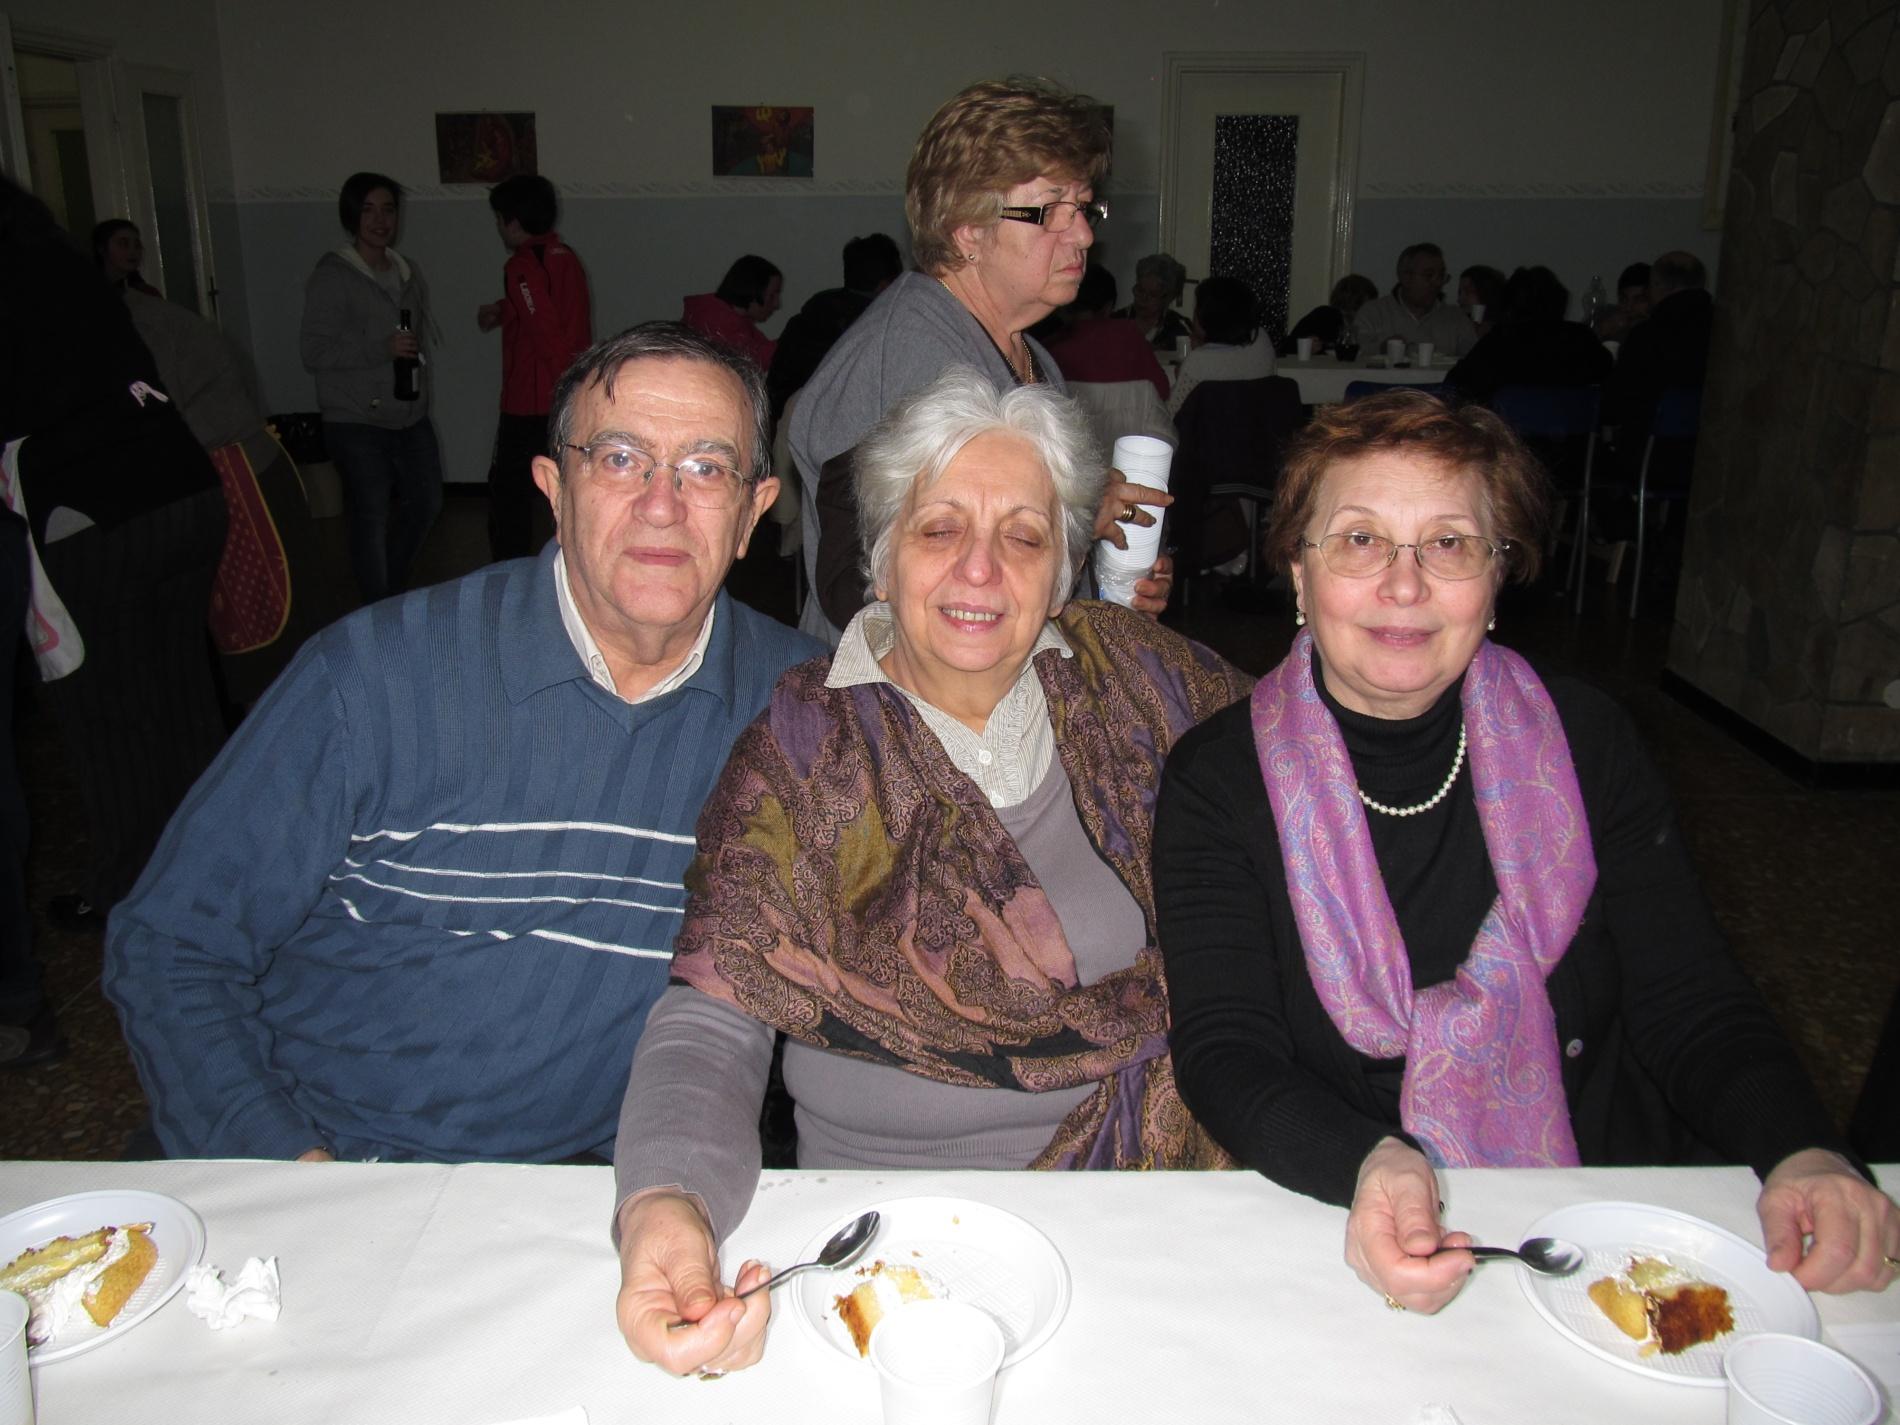 polentata-2015-03-07-21-31-54